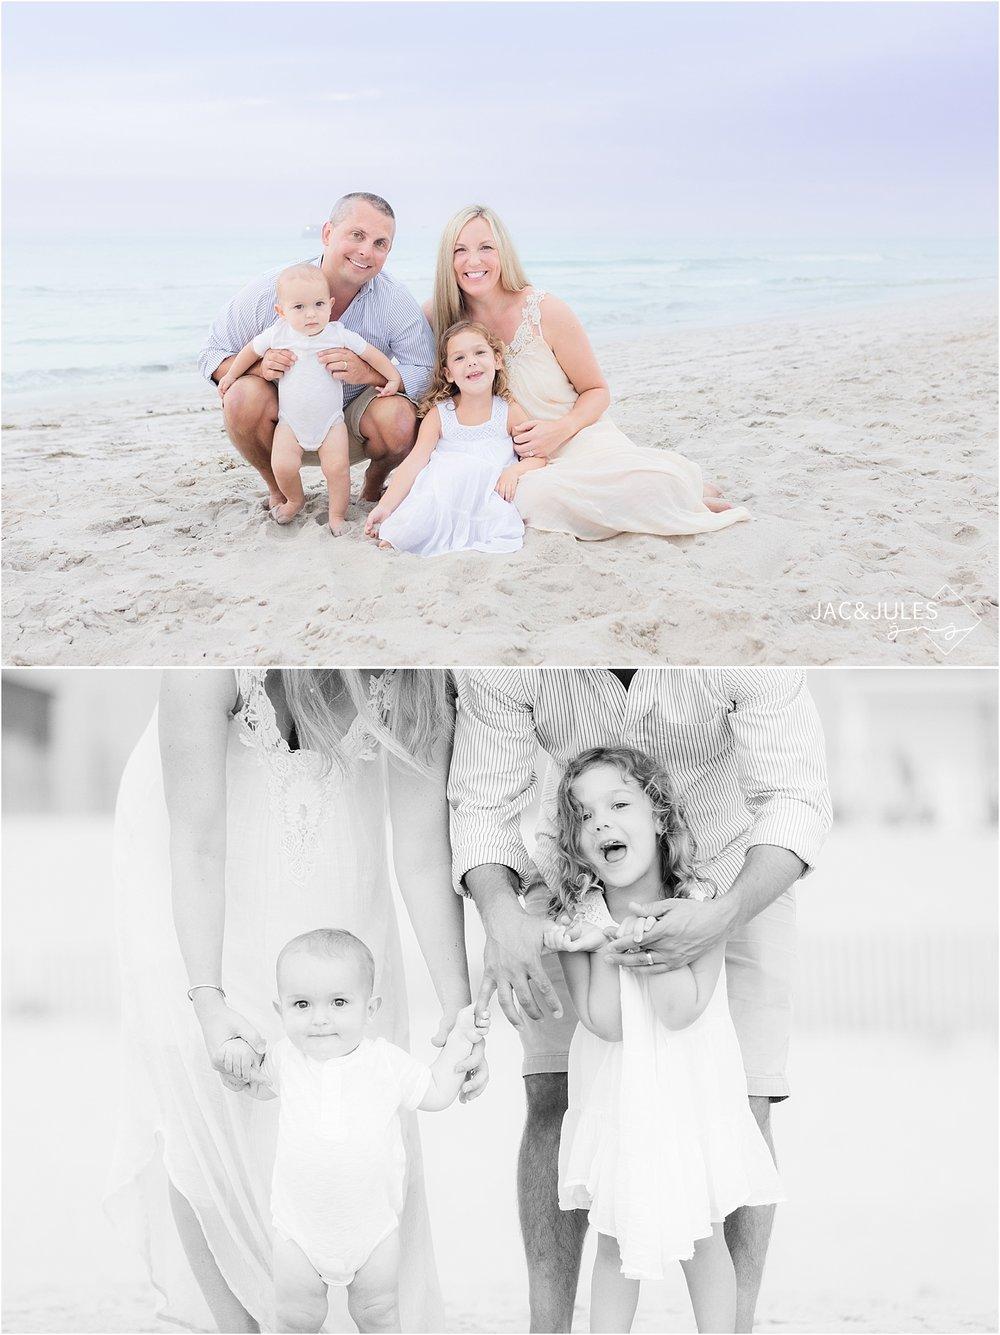 fun family photos on the beach in Mantoloking NJ